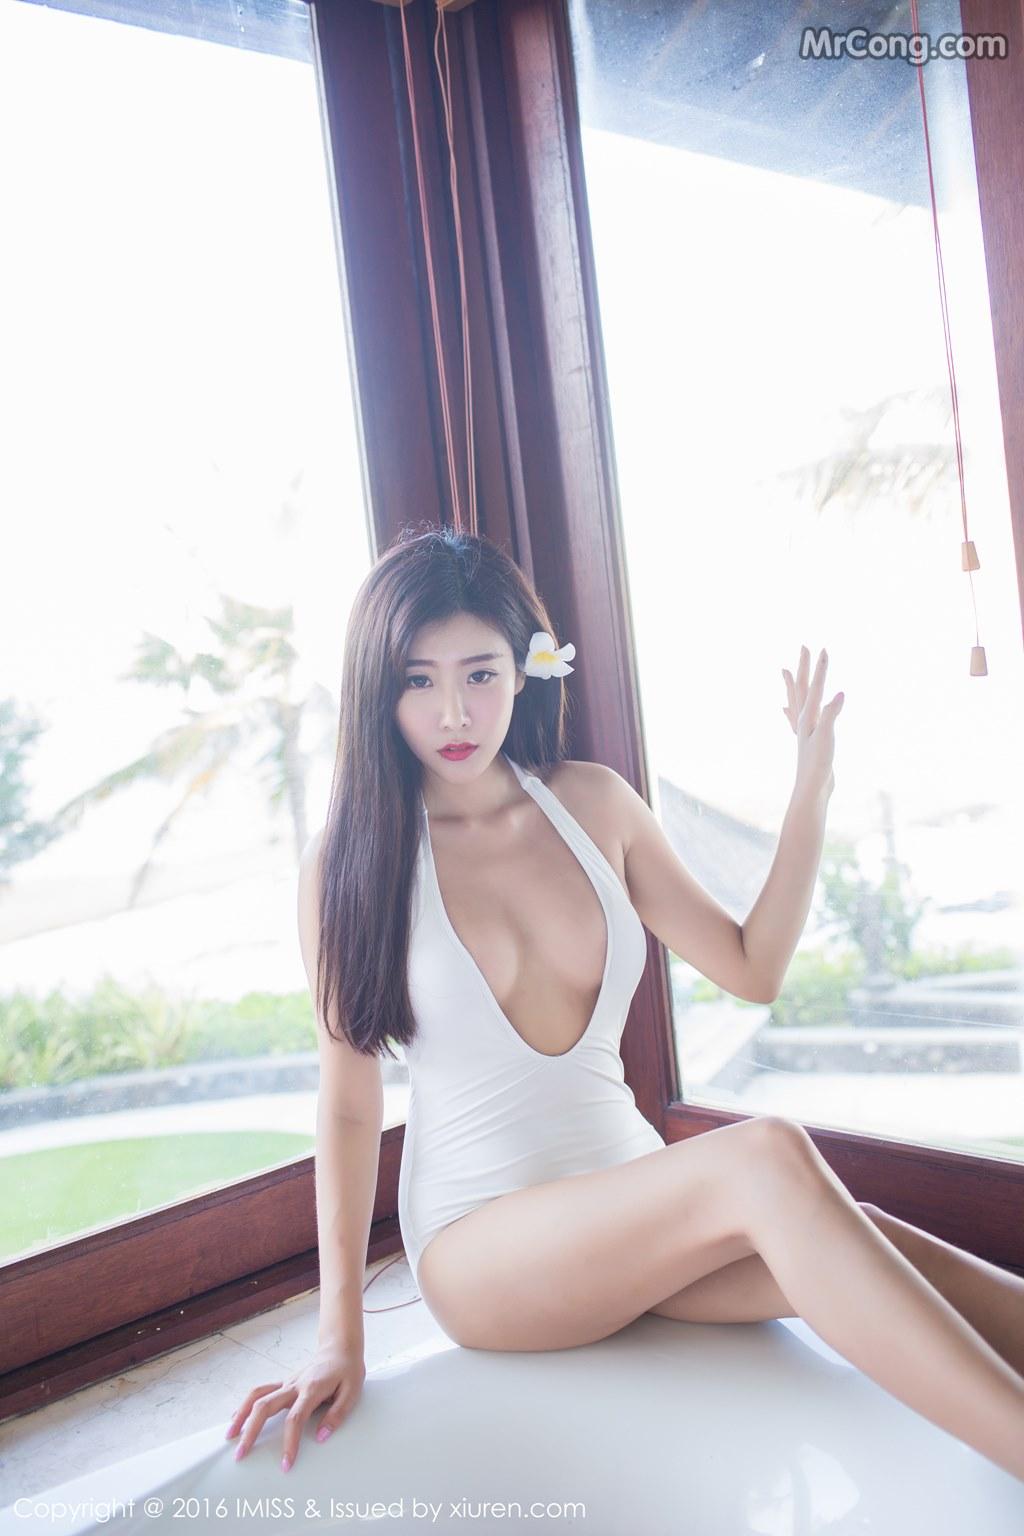 IMISS Vol.103: Model Cheng Xiaofan (程小烦不烦) (56P)